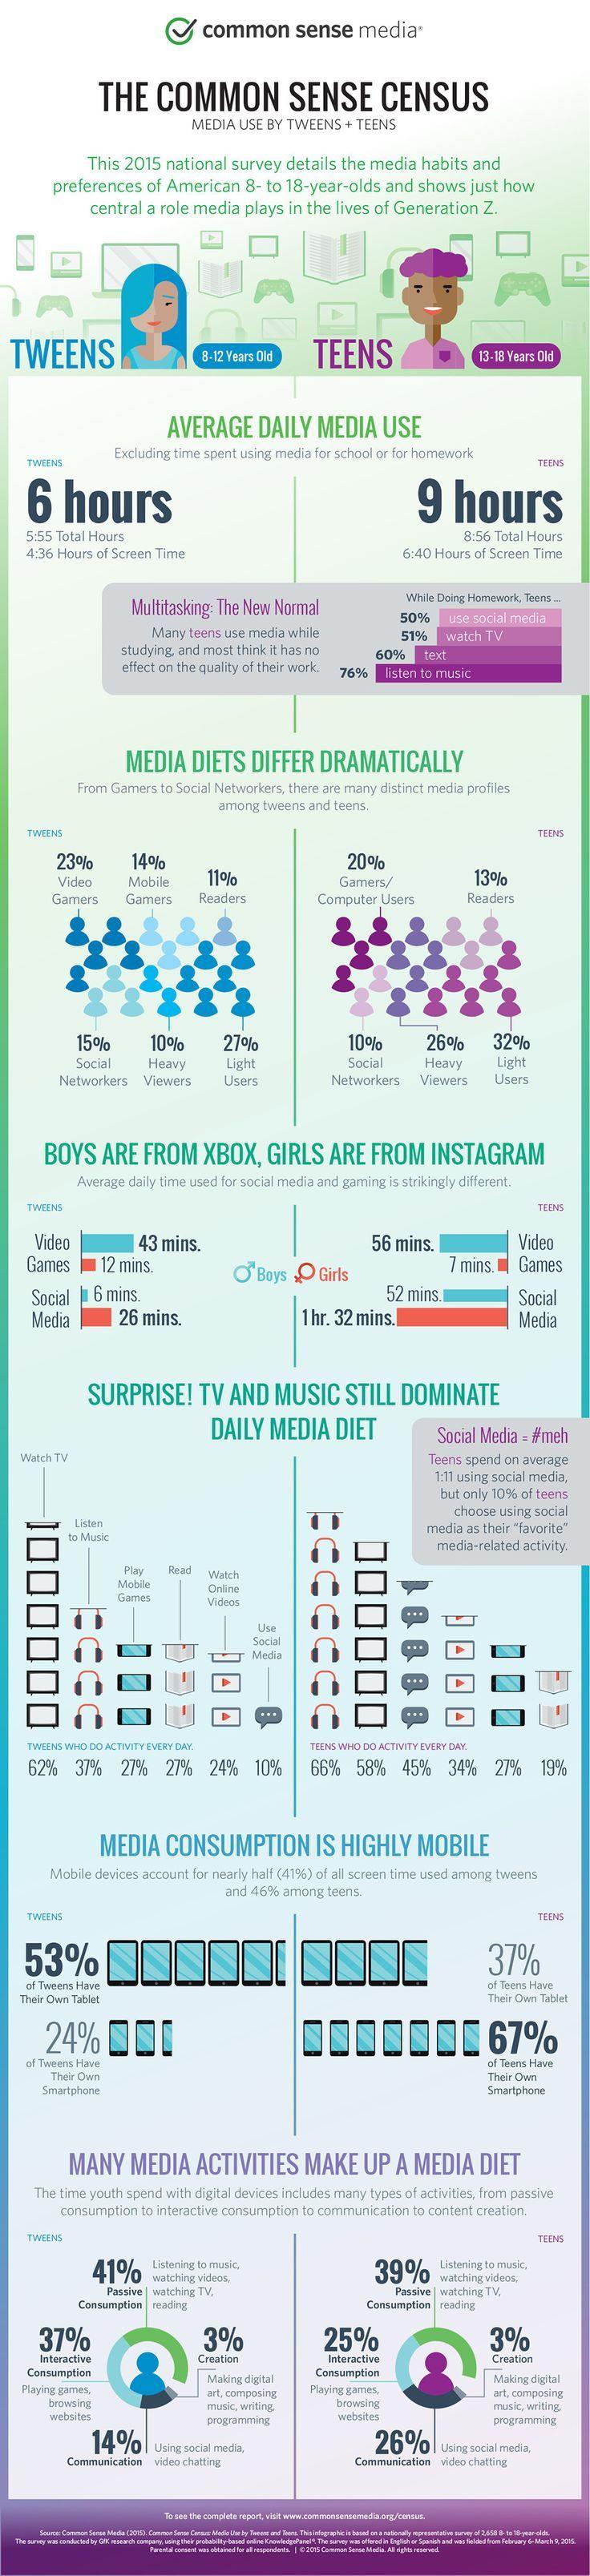 Digital Marketing : The Common Sense Census #Infographic